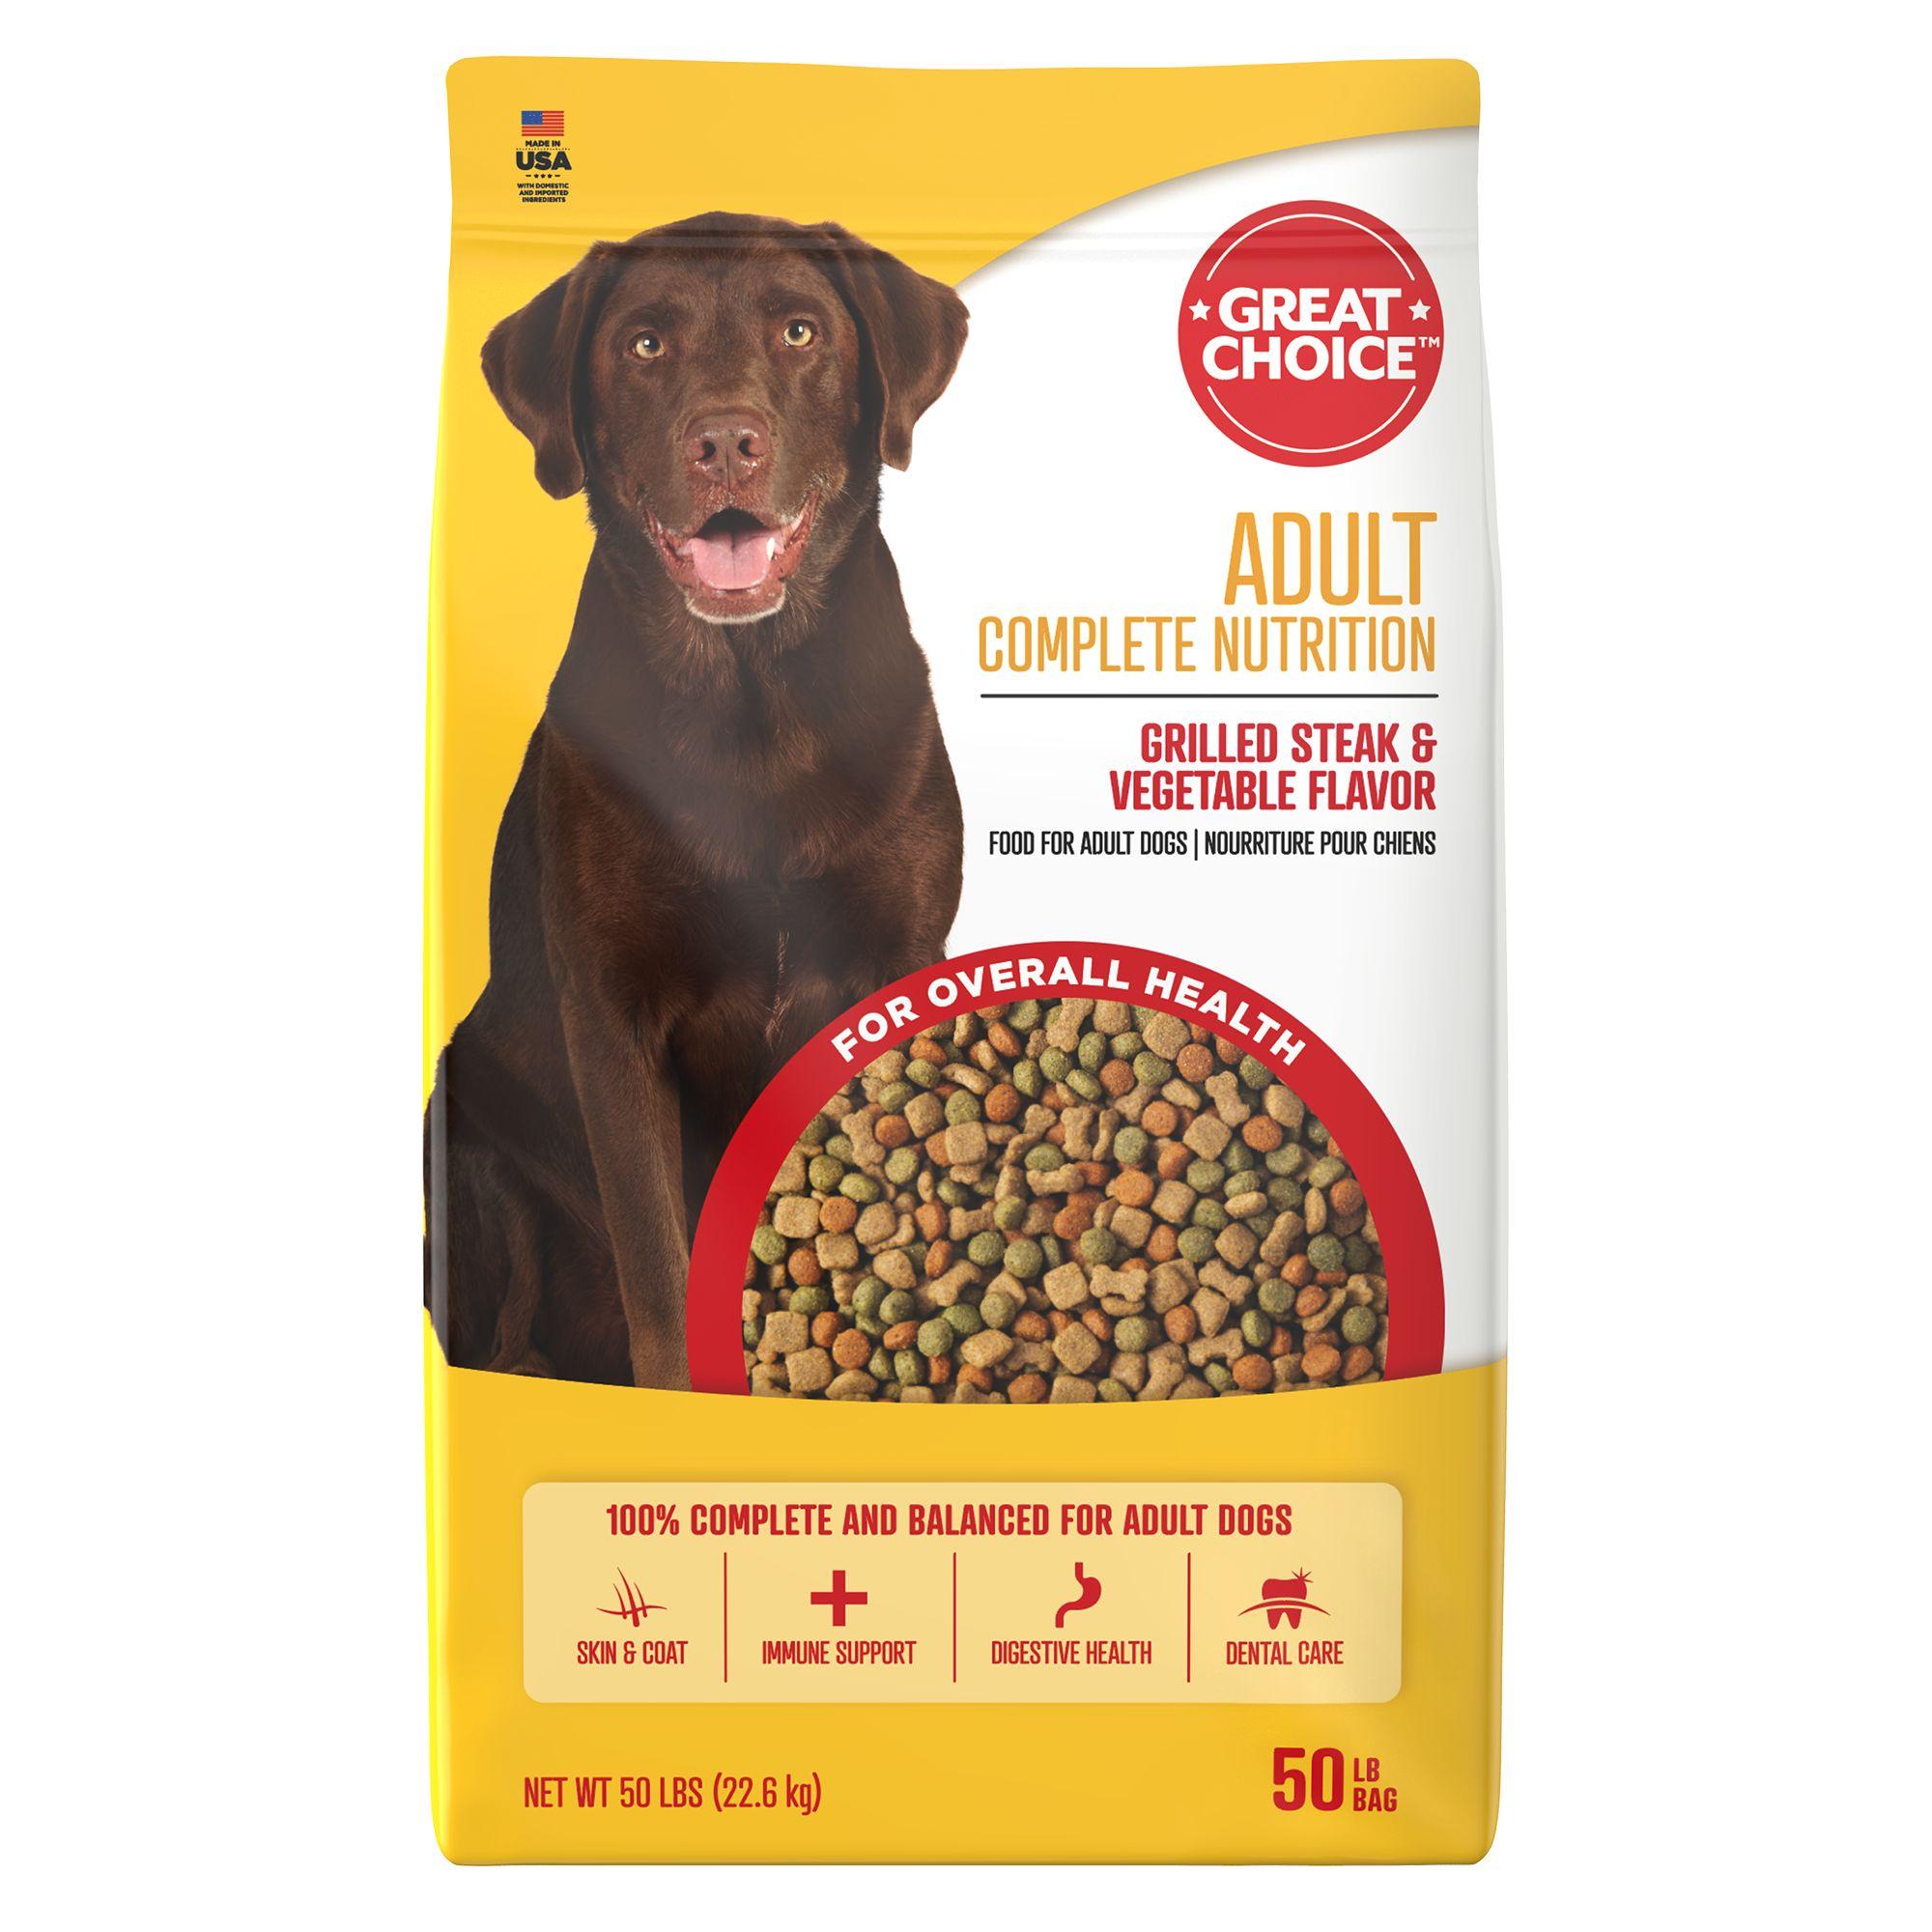 Grreat Choice Complete Nutrition Adult Dog Food Steak Veggie